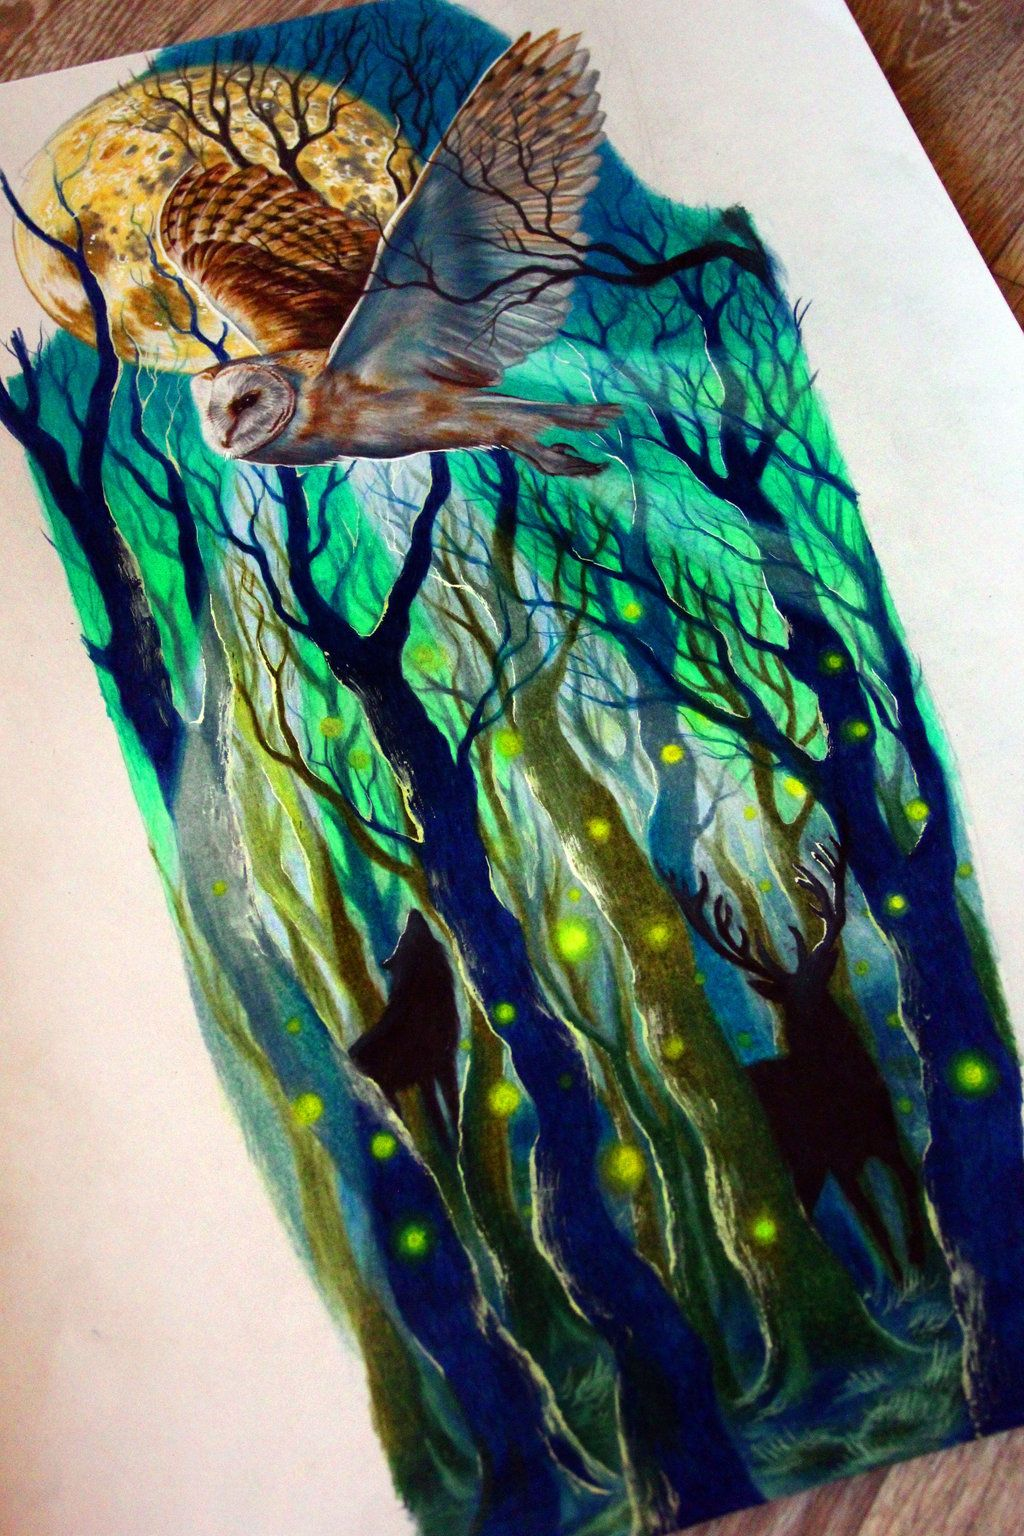 Pin by Robert Snowden on tattoo ideas | Pinterest | Magic forest ...